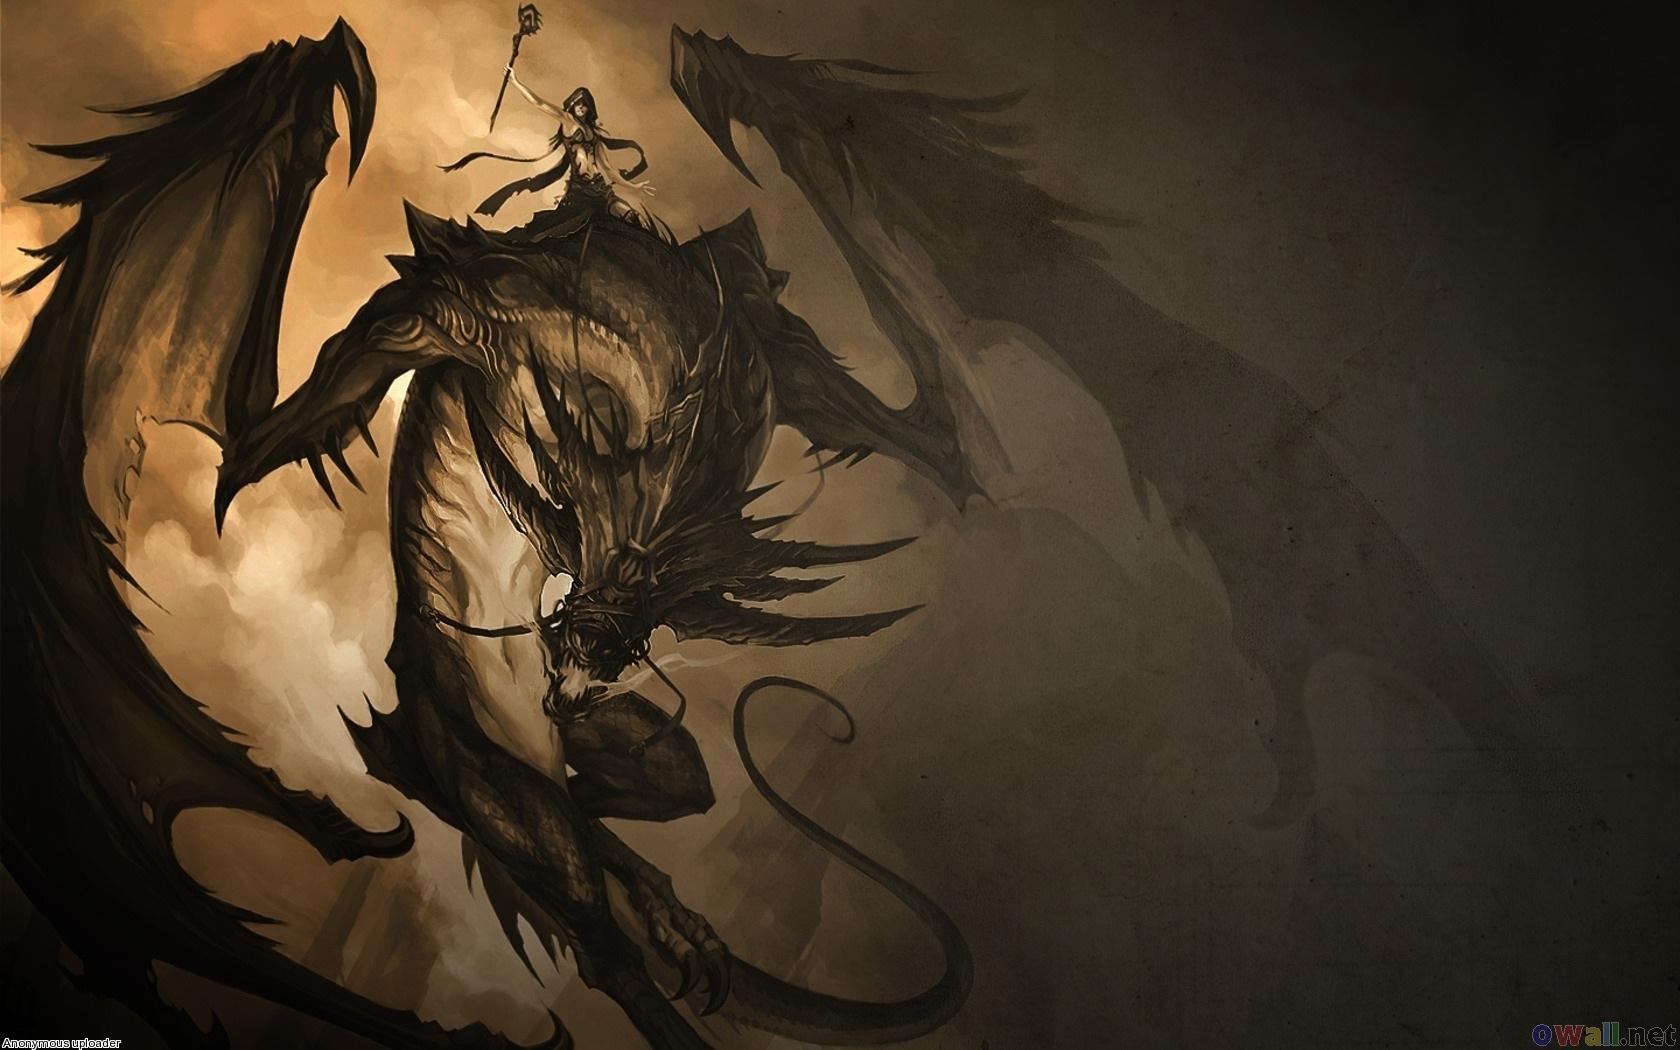 Hd wallpaper sunset beach - Black Dragon Wallpaper Desktop Wallpapersafari